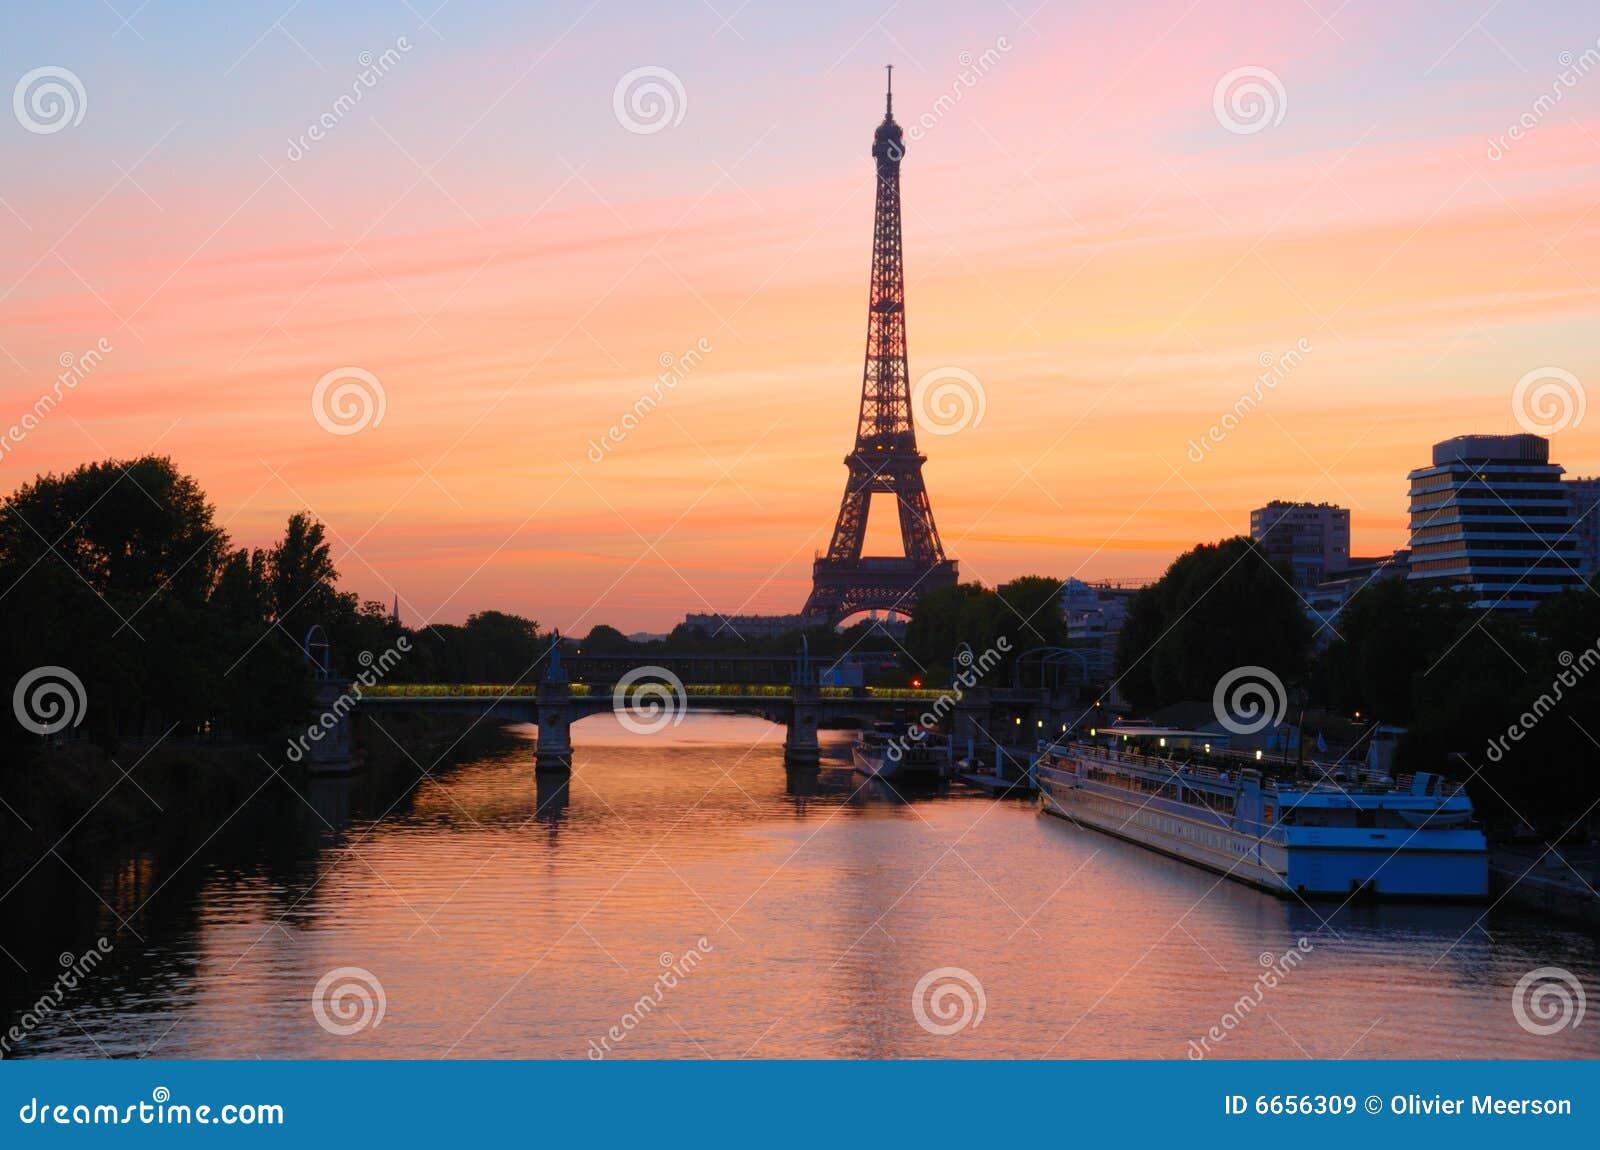 Old paris street map royalty free stock photo image 15885665 - Nascer Do Sol Da Torre Eiffel Paris Imagens De Stock Royalty Free